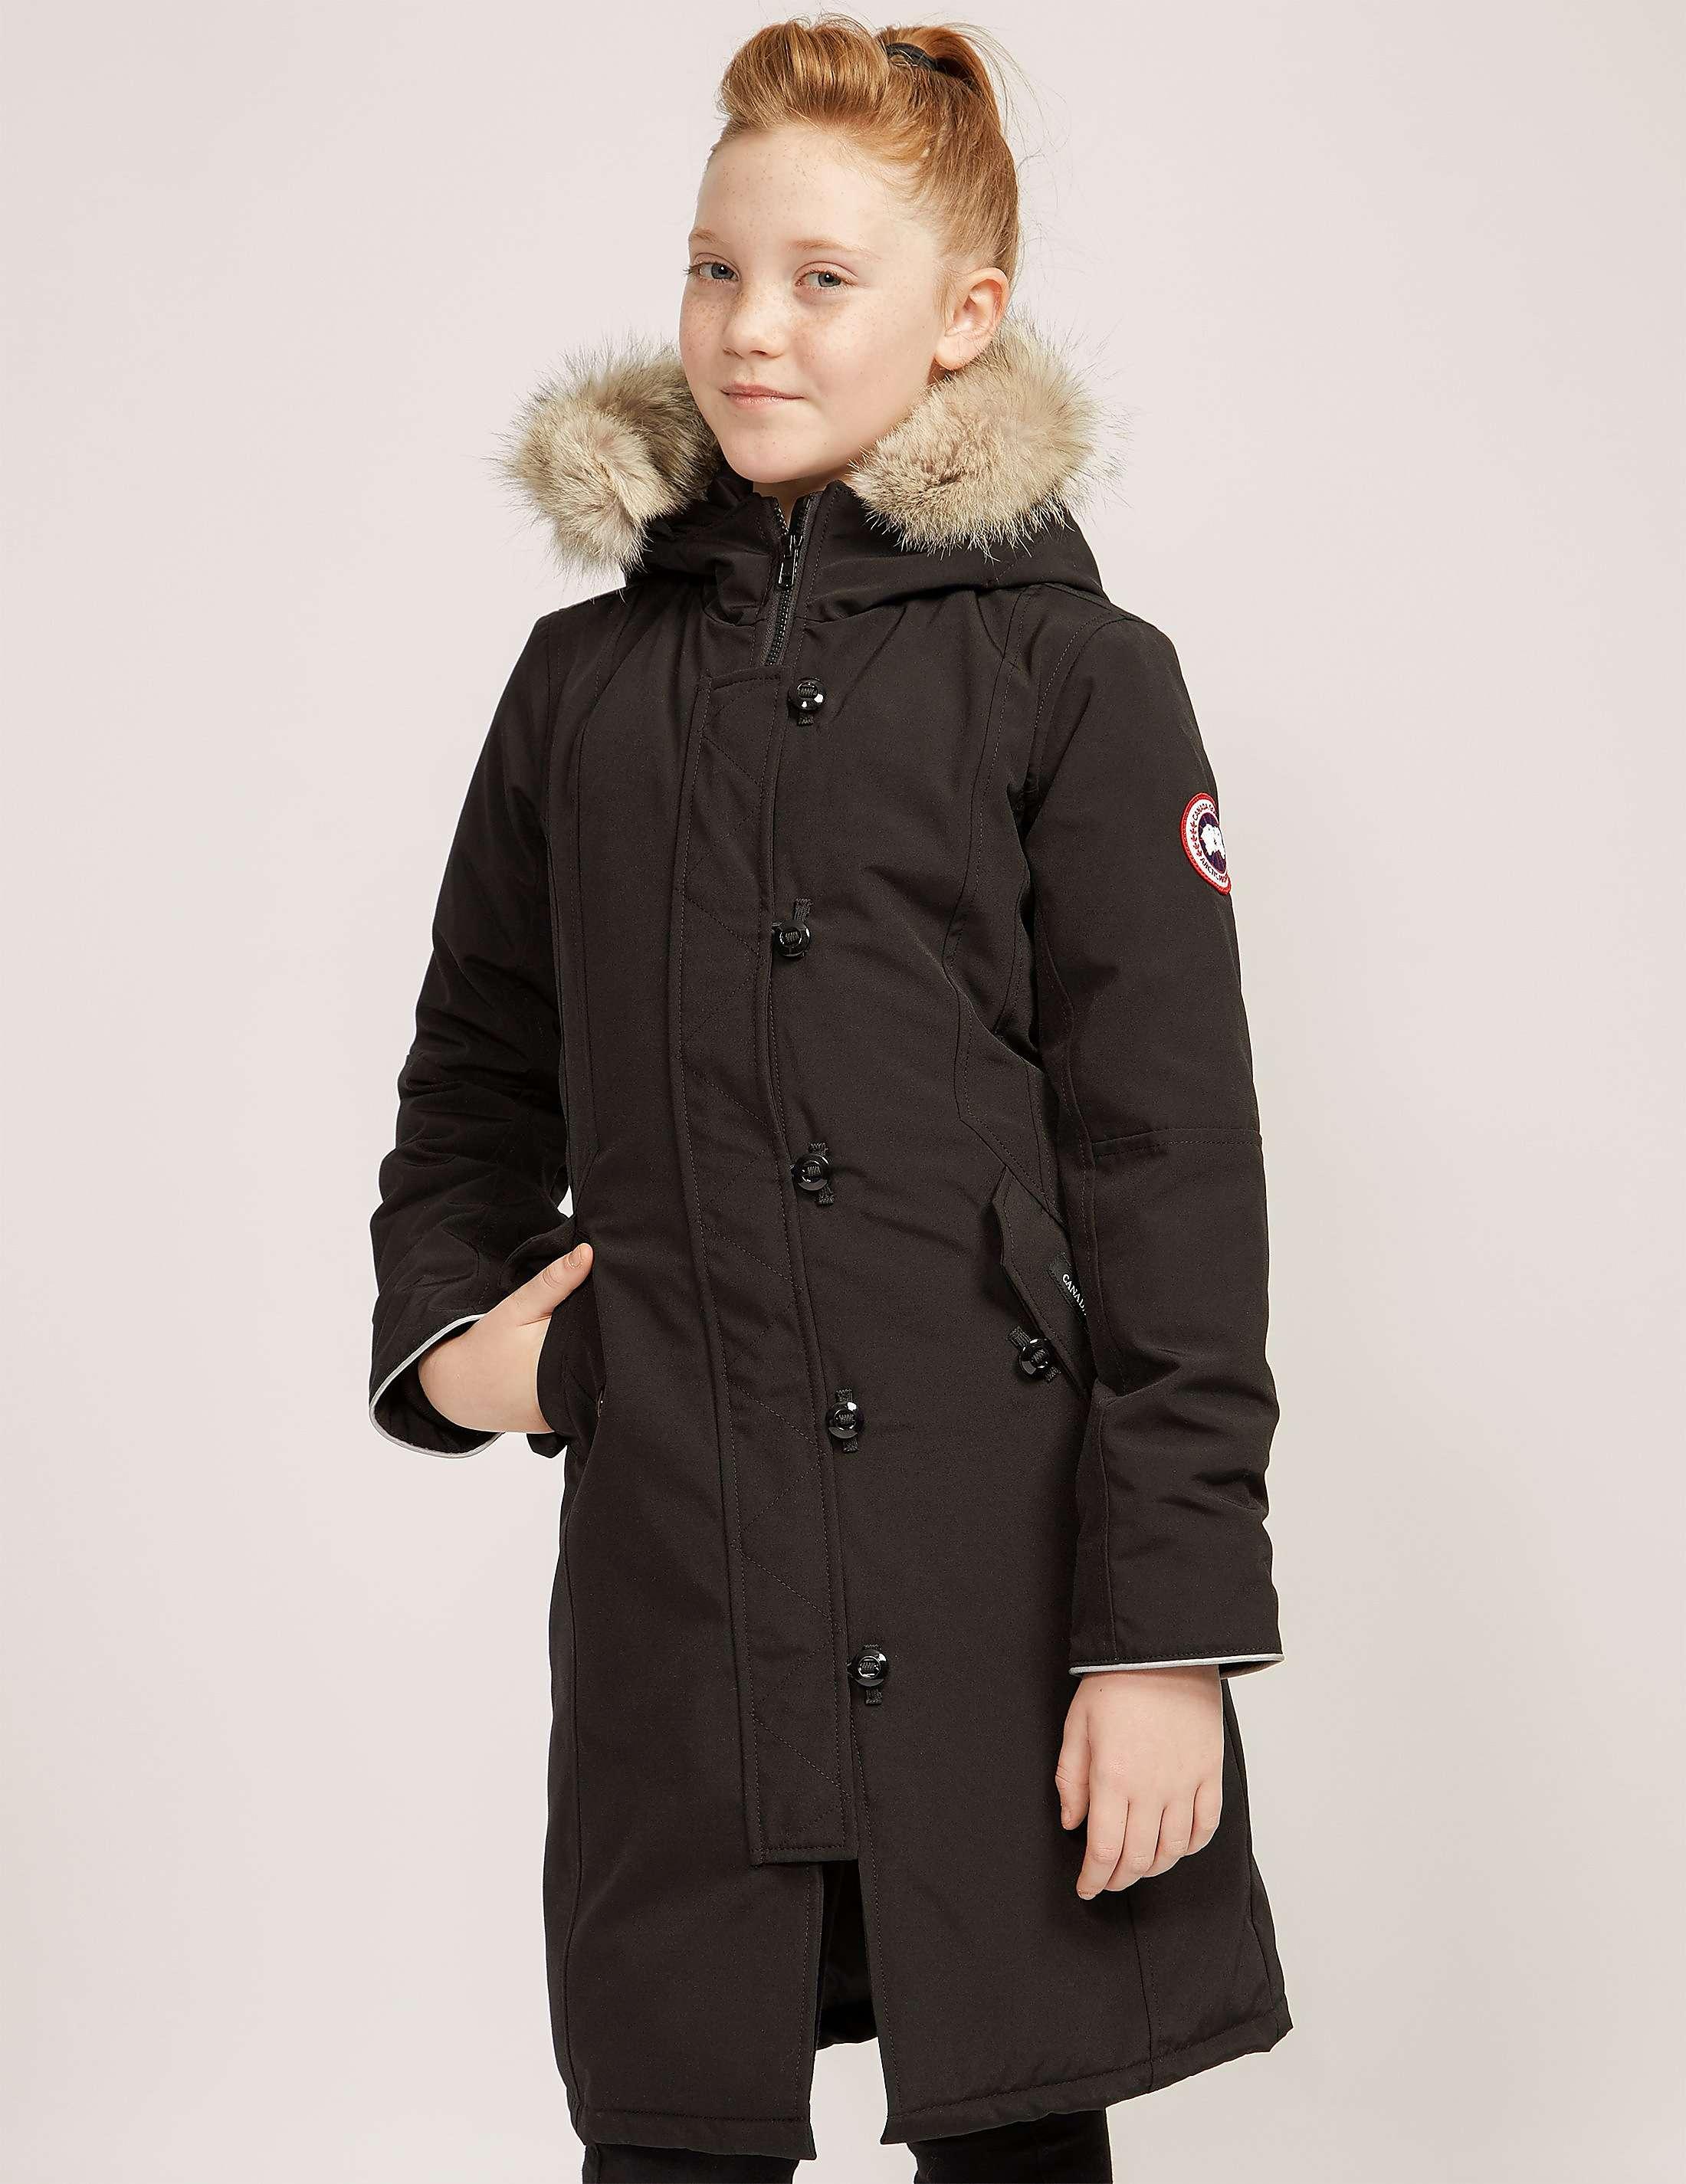 Canada Goose kensington parka online cheap - Canada Goose - Jackets & More | Kids | Tessuti